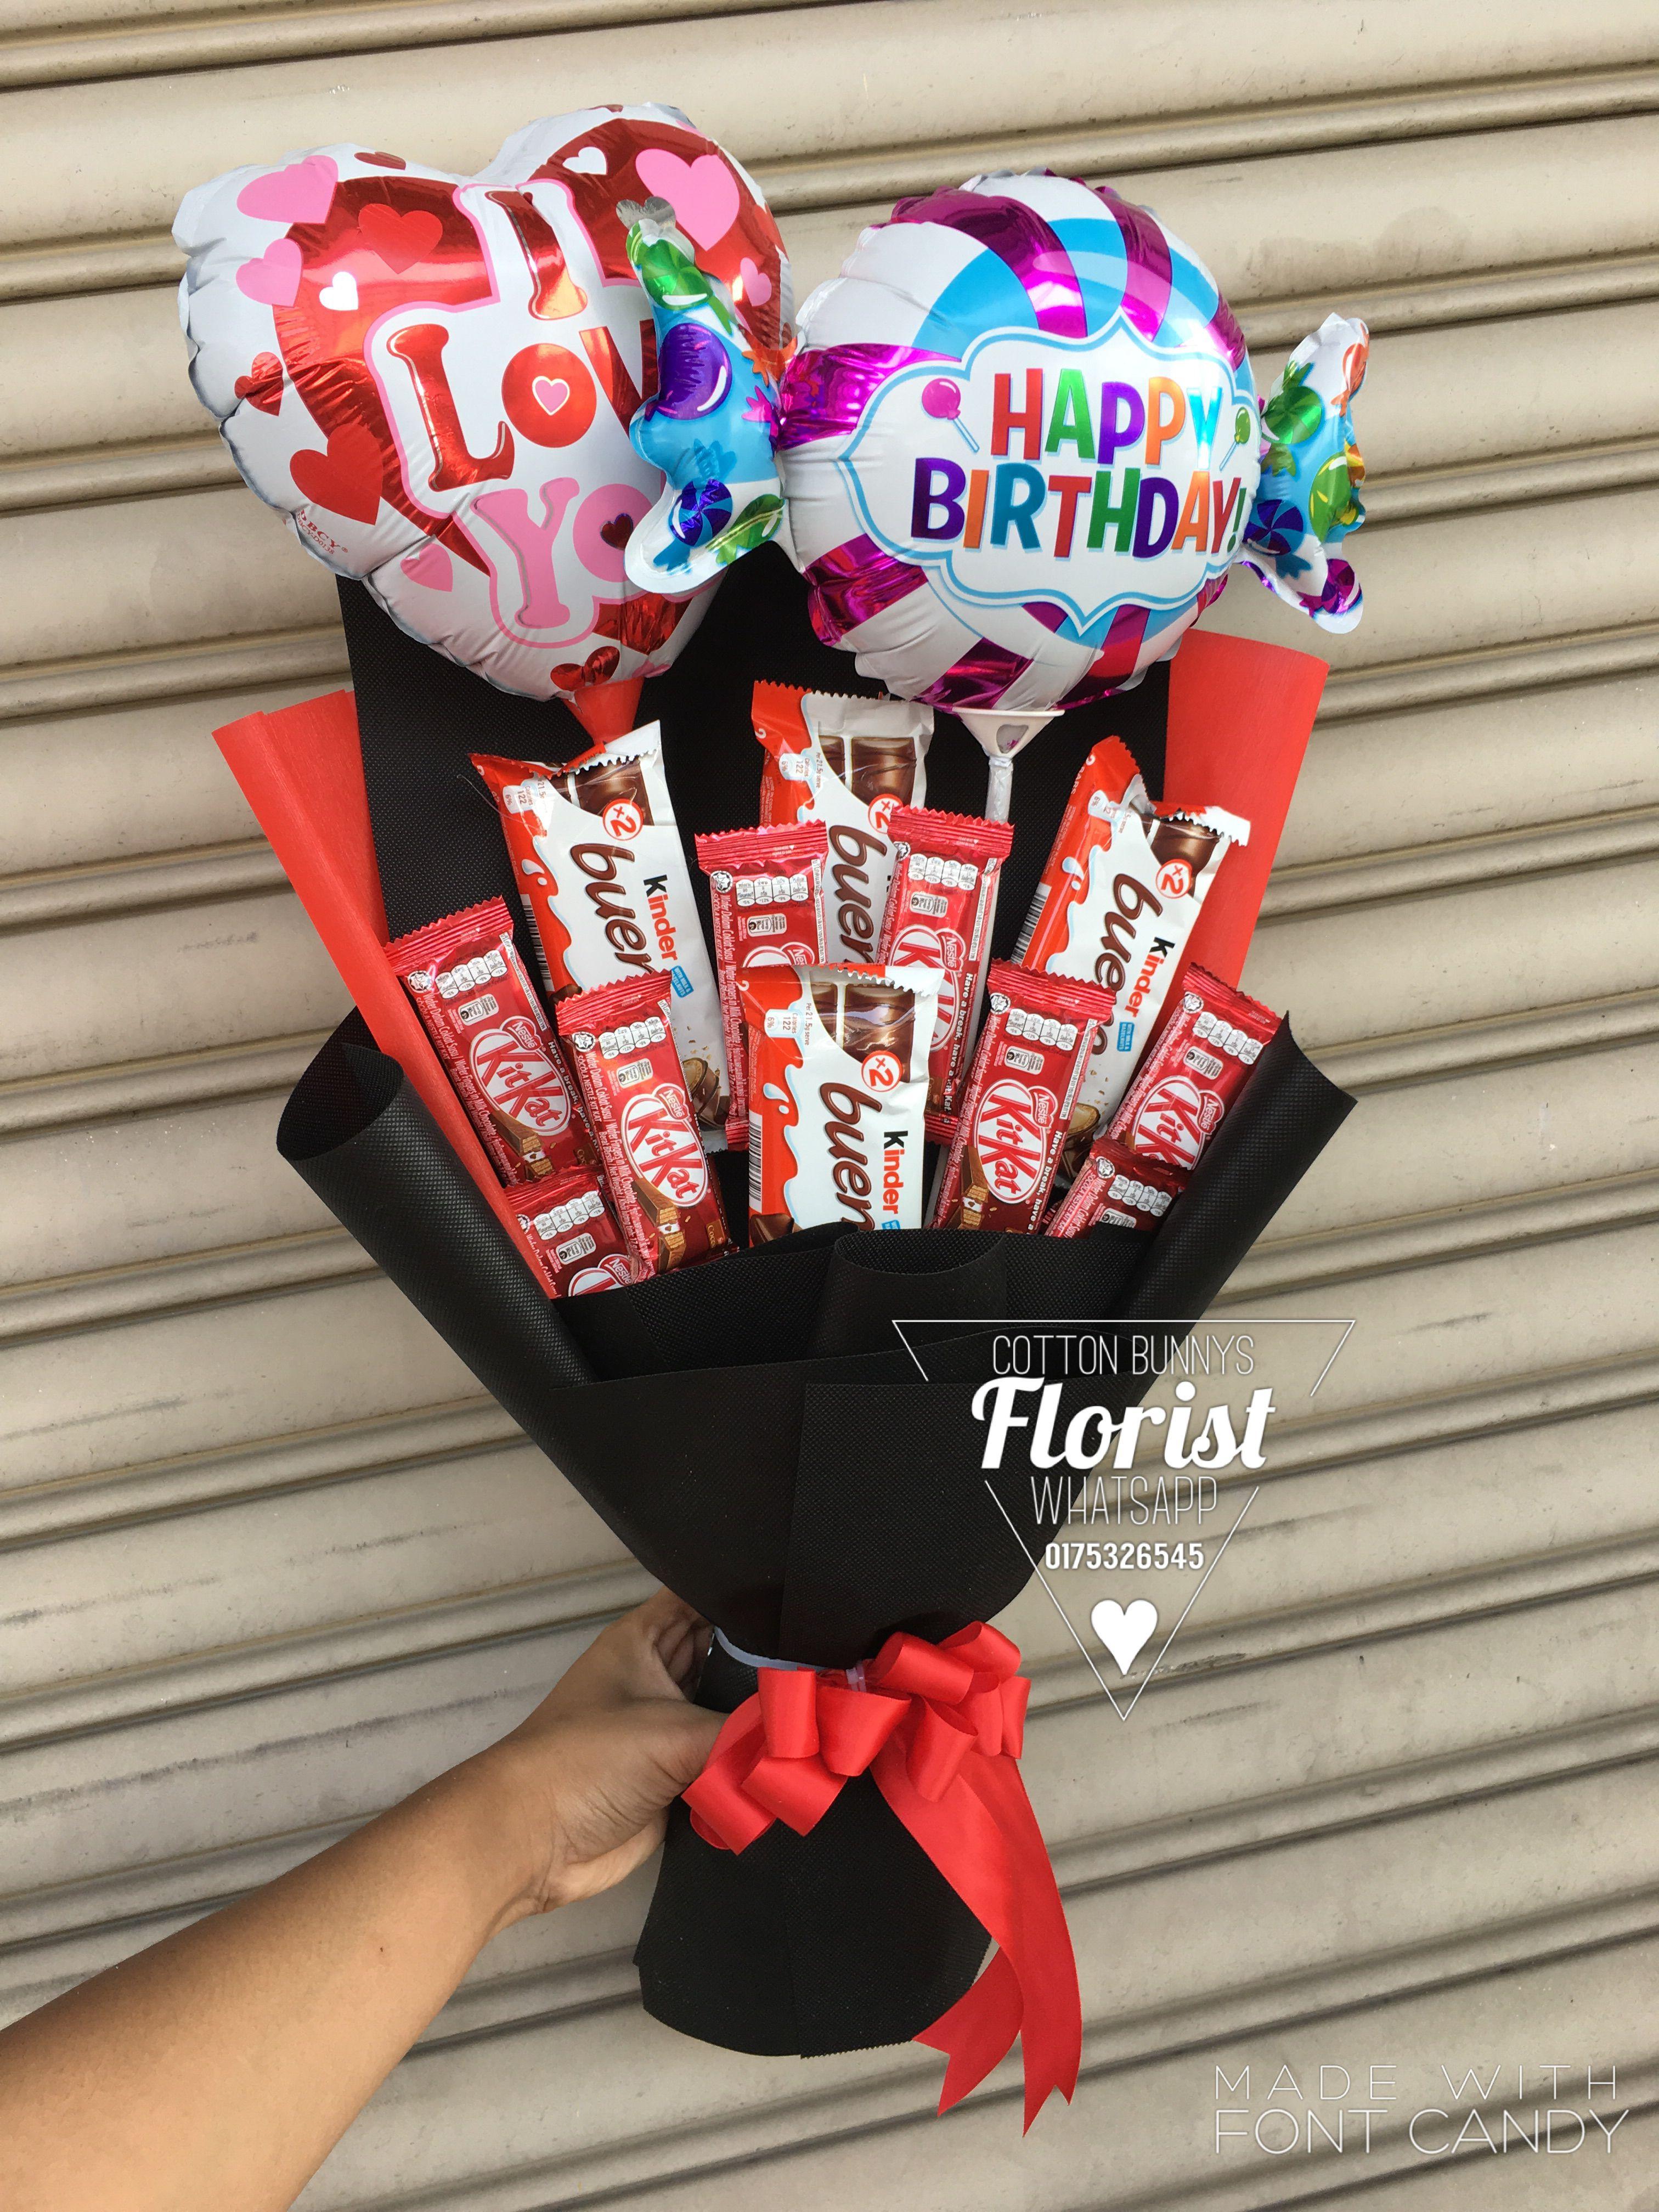 Chocolate Bouquet Kitkat Kinder Bueno Balloon